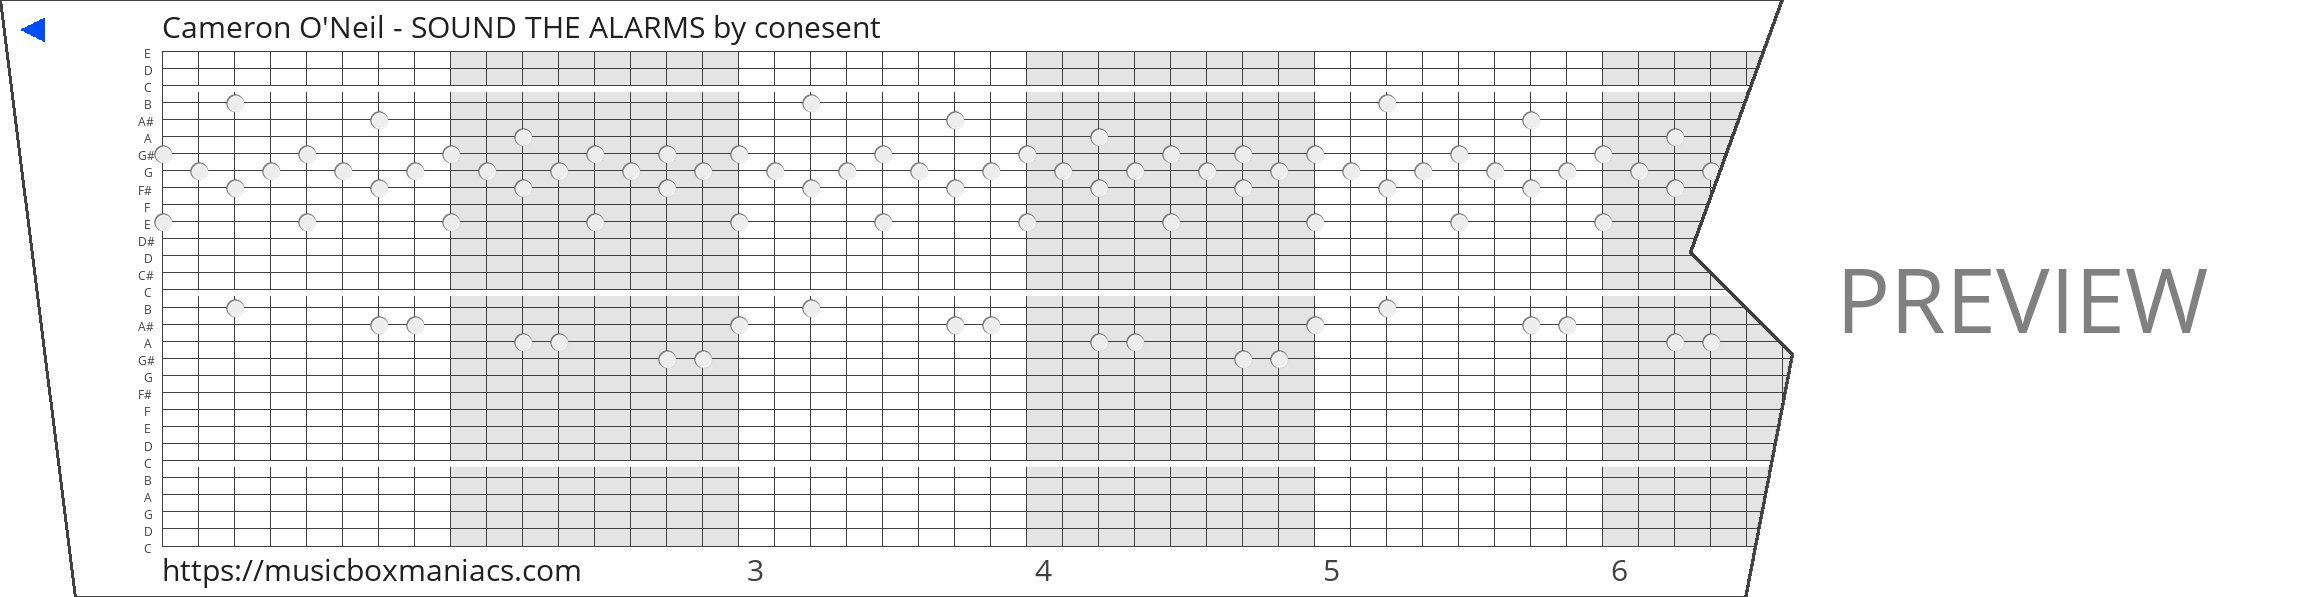 Cameron O'Neil - SOUND THE ALARMS 30 note music box paper strip